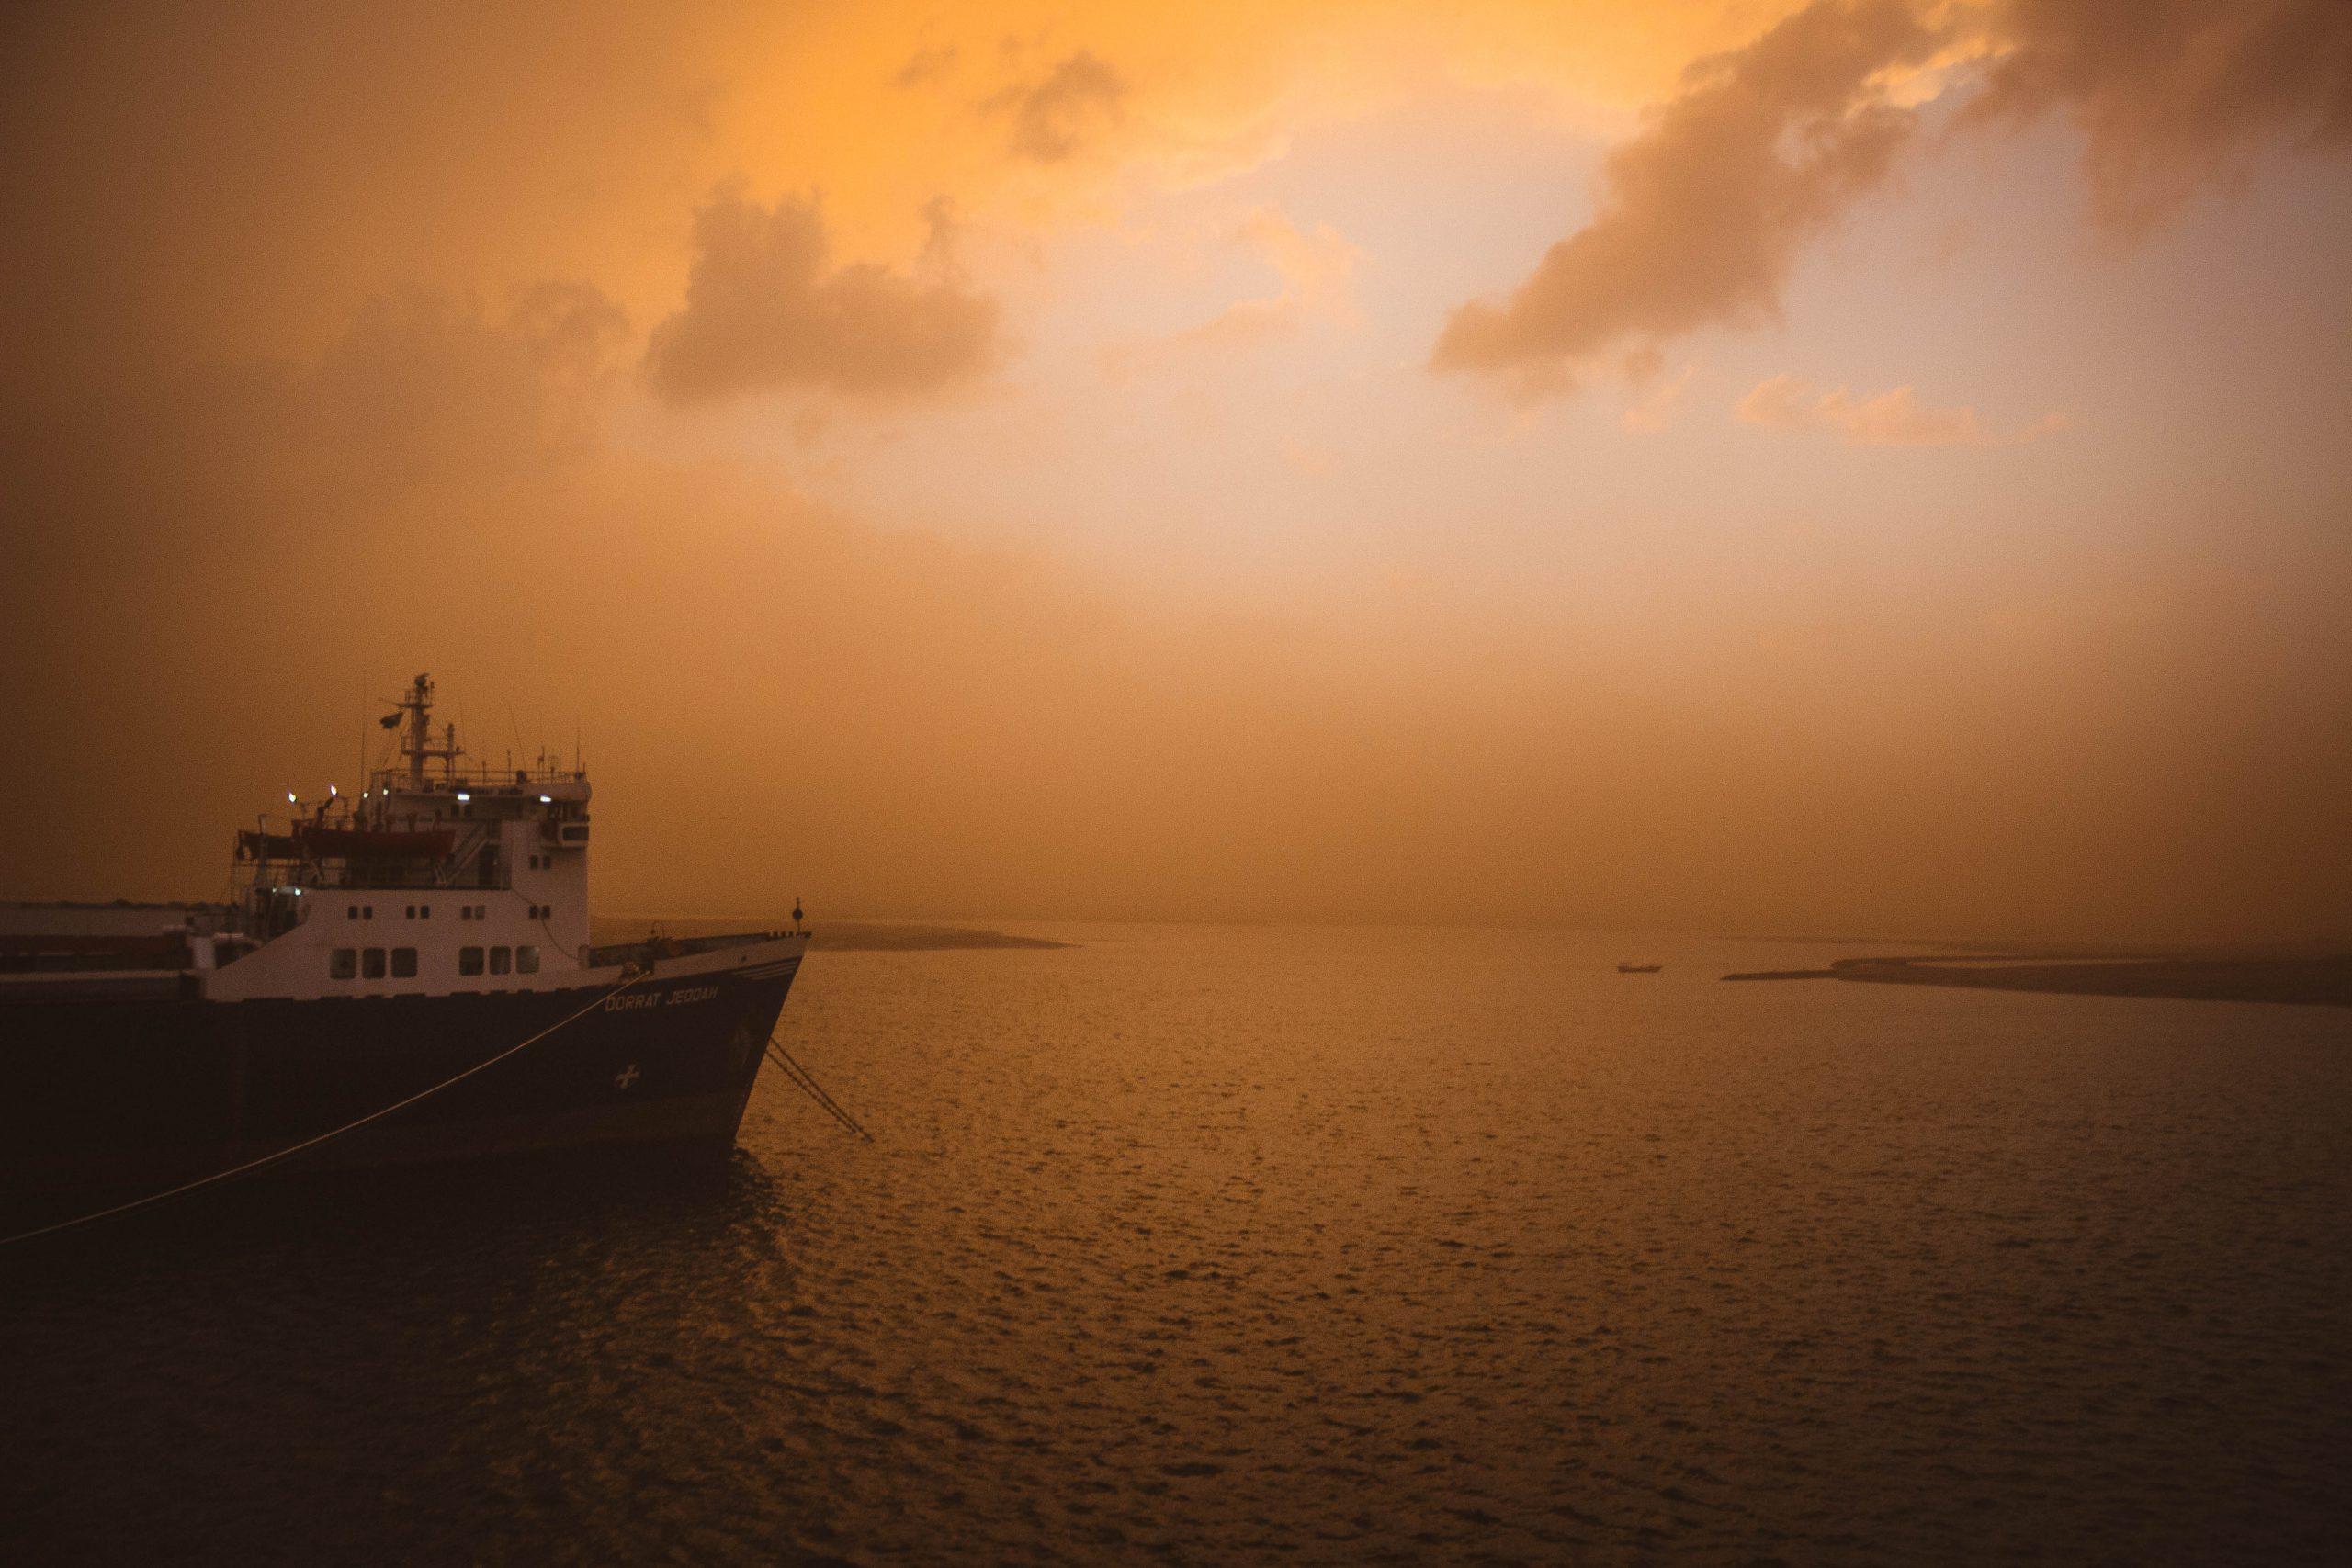 Twilight, Photo: Bow of Ship-Chinedum Odunze